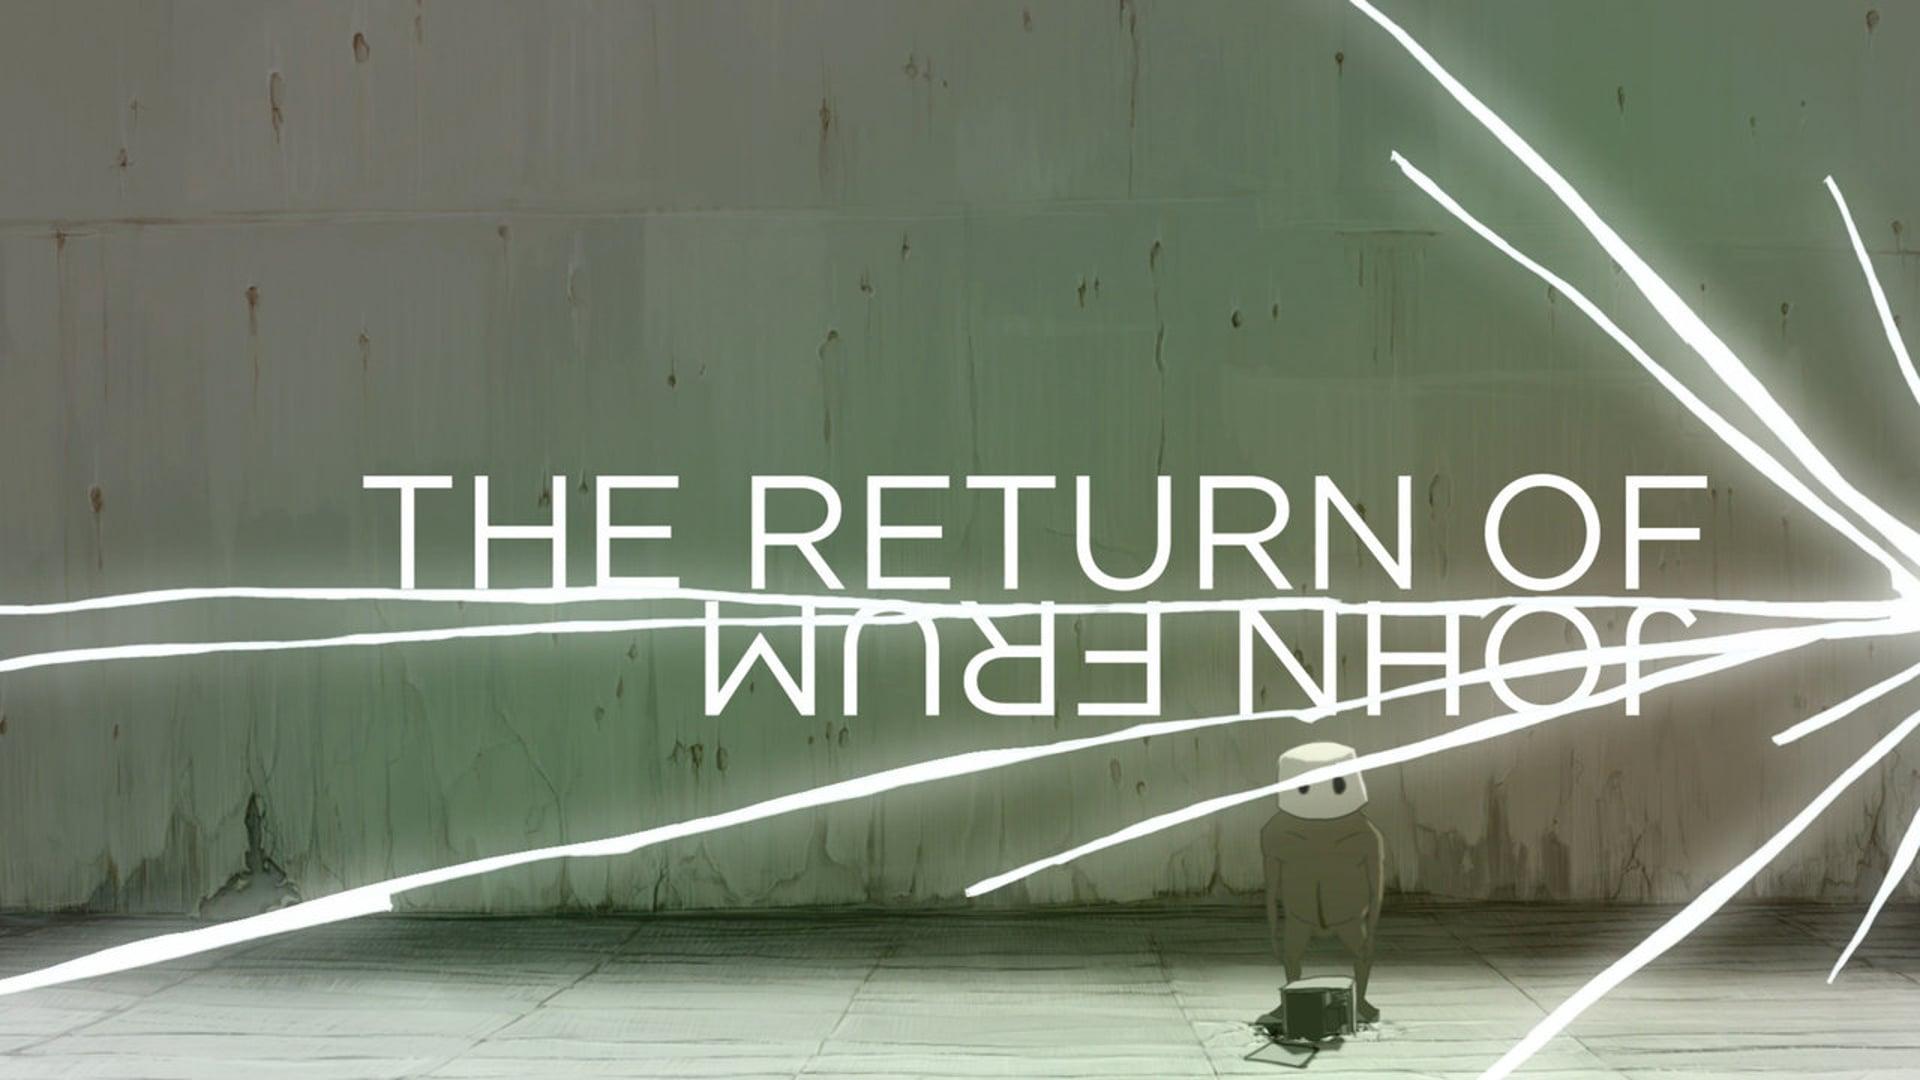 THE RETURN OF JOHN FRUM